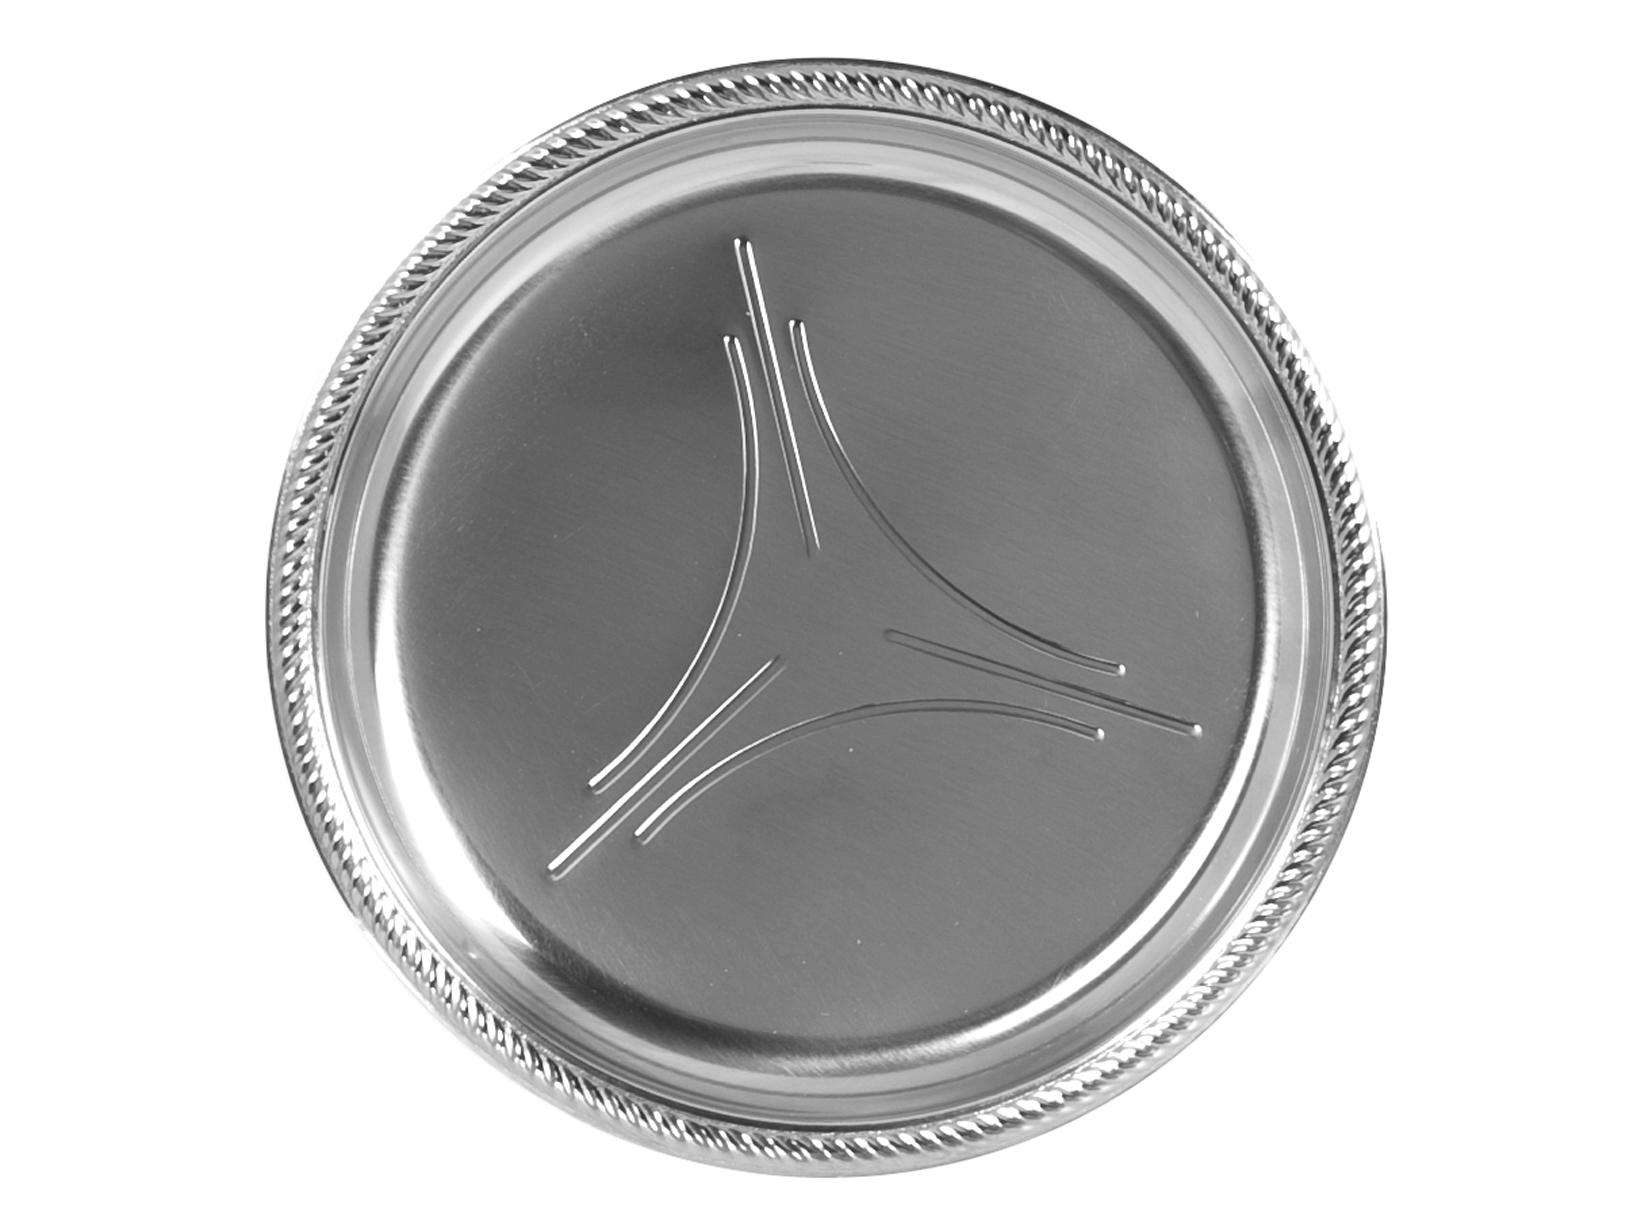 Acquista Piattino Inox Mercurio Cm14 Arredo 17525375 | Glooke.com